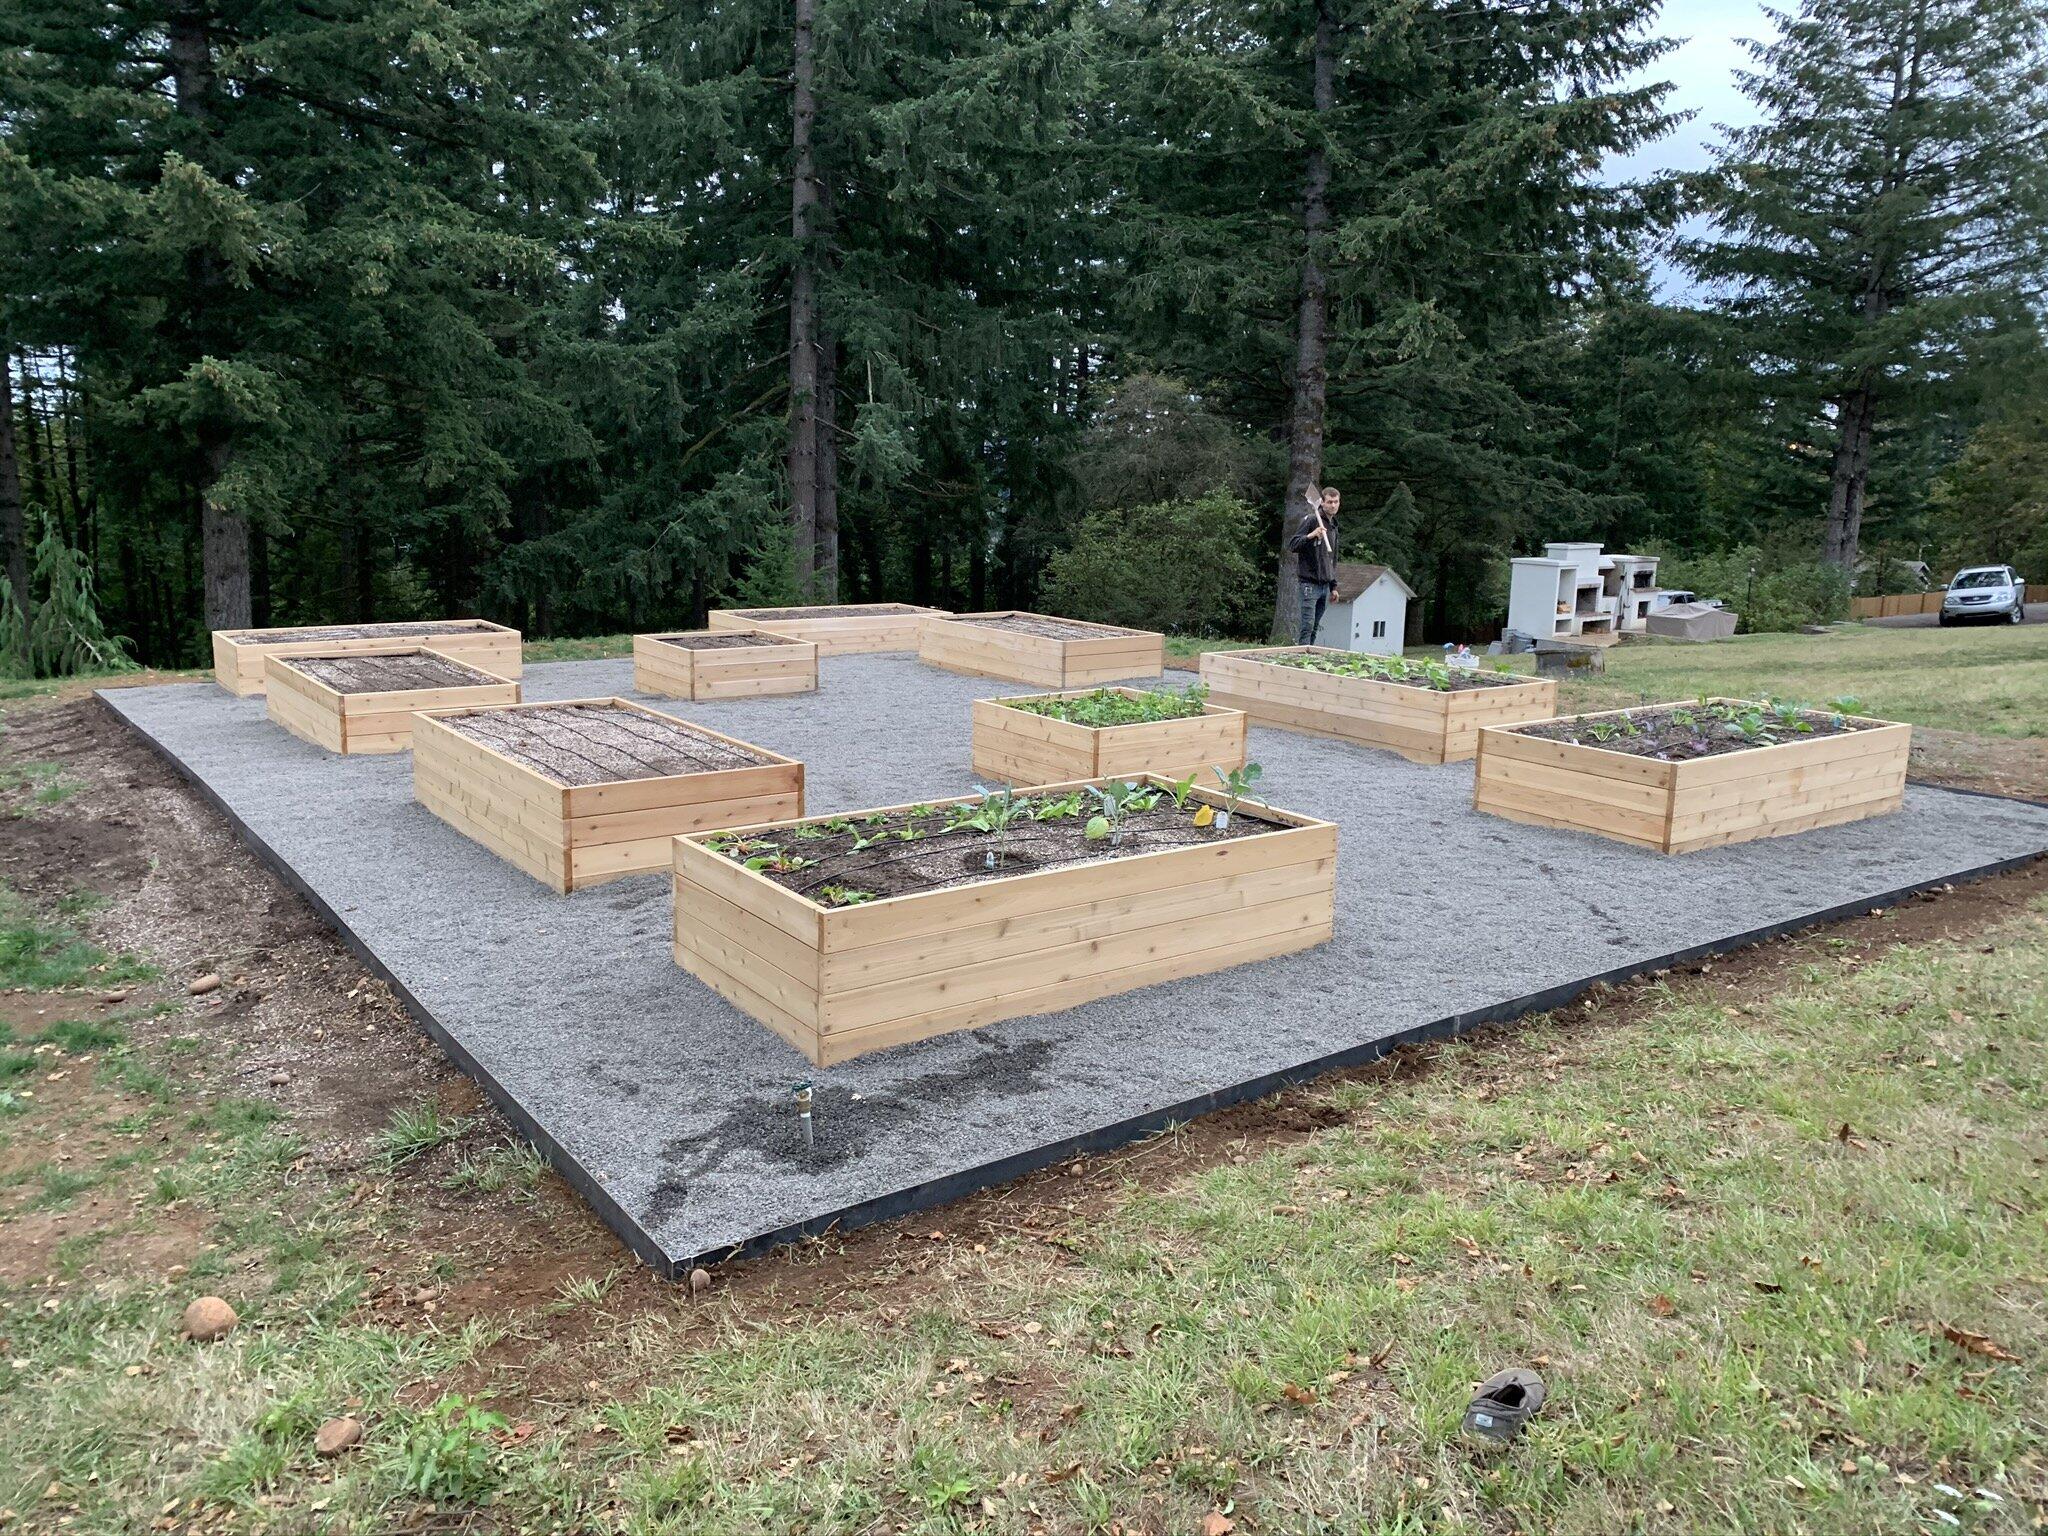 Journal Portland Edible Gardens Raised Garden Beds Edible Landscaping And Vegetable Garden Help In Portland Or